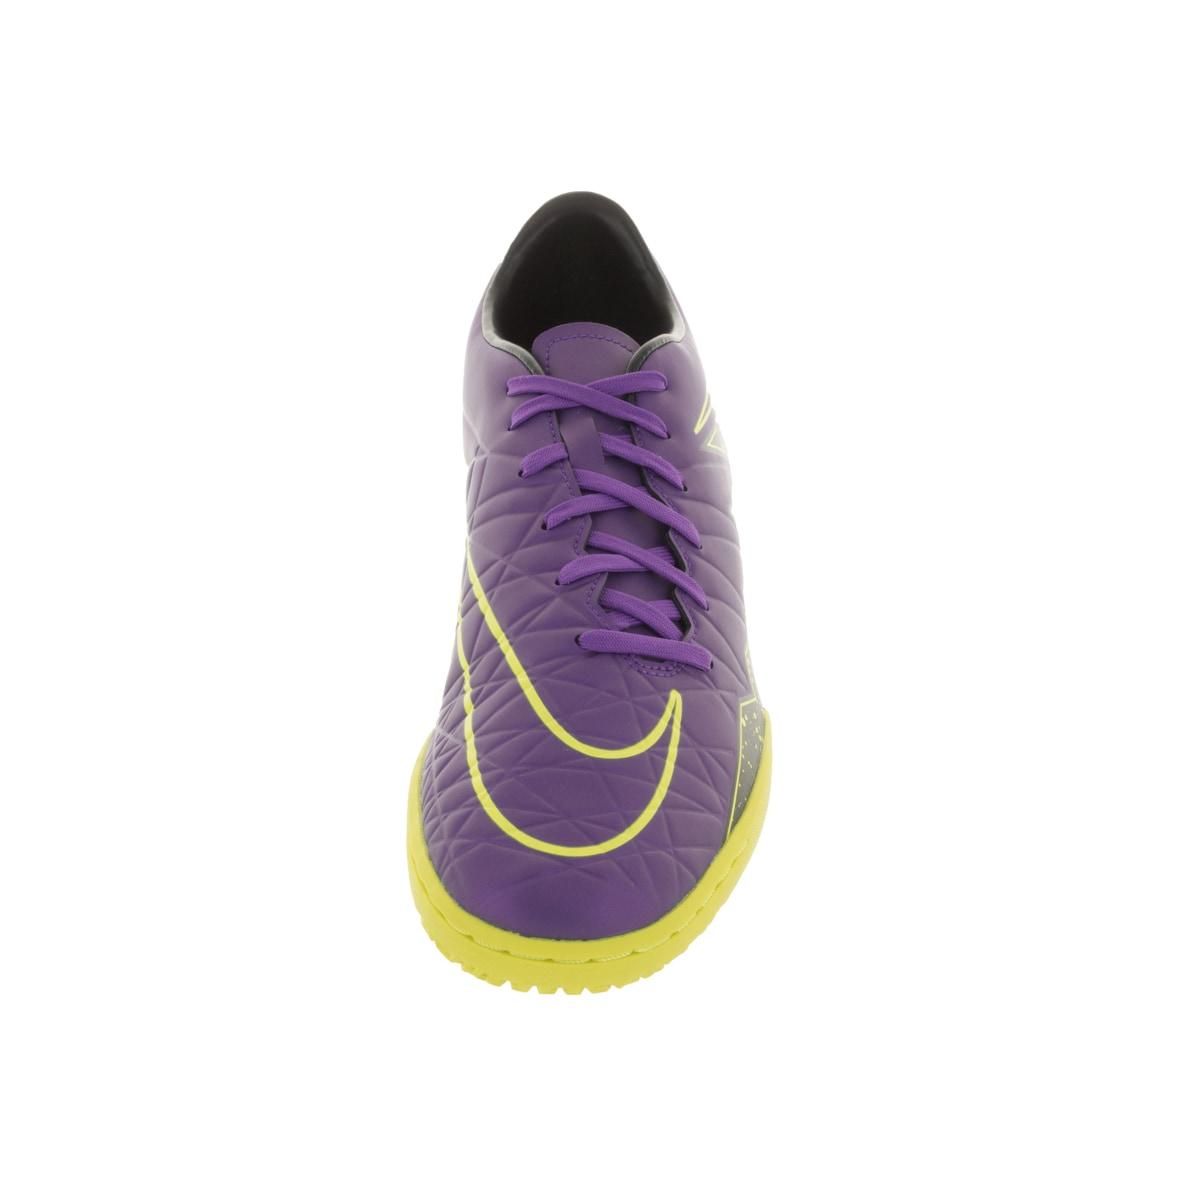 c7146cf742d102 Shop Nike Men s Hypervenom Phelon Ii Ic Hyper Grape  Grape Black Vlt Indoor  Soccer Shoe - Free Shipping Today - Overstock.com - 12118245